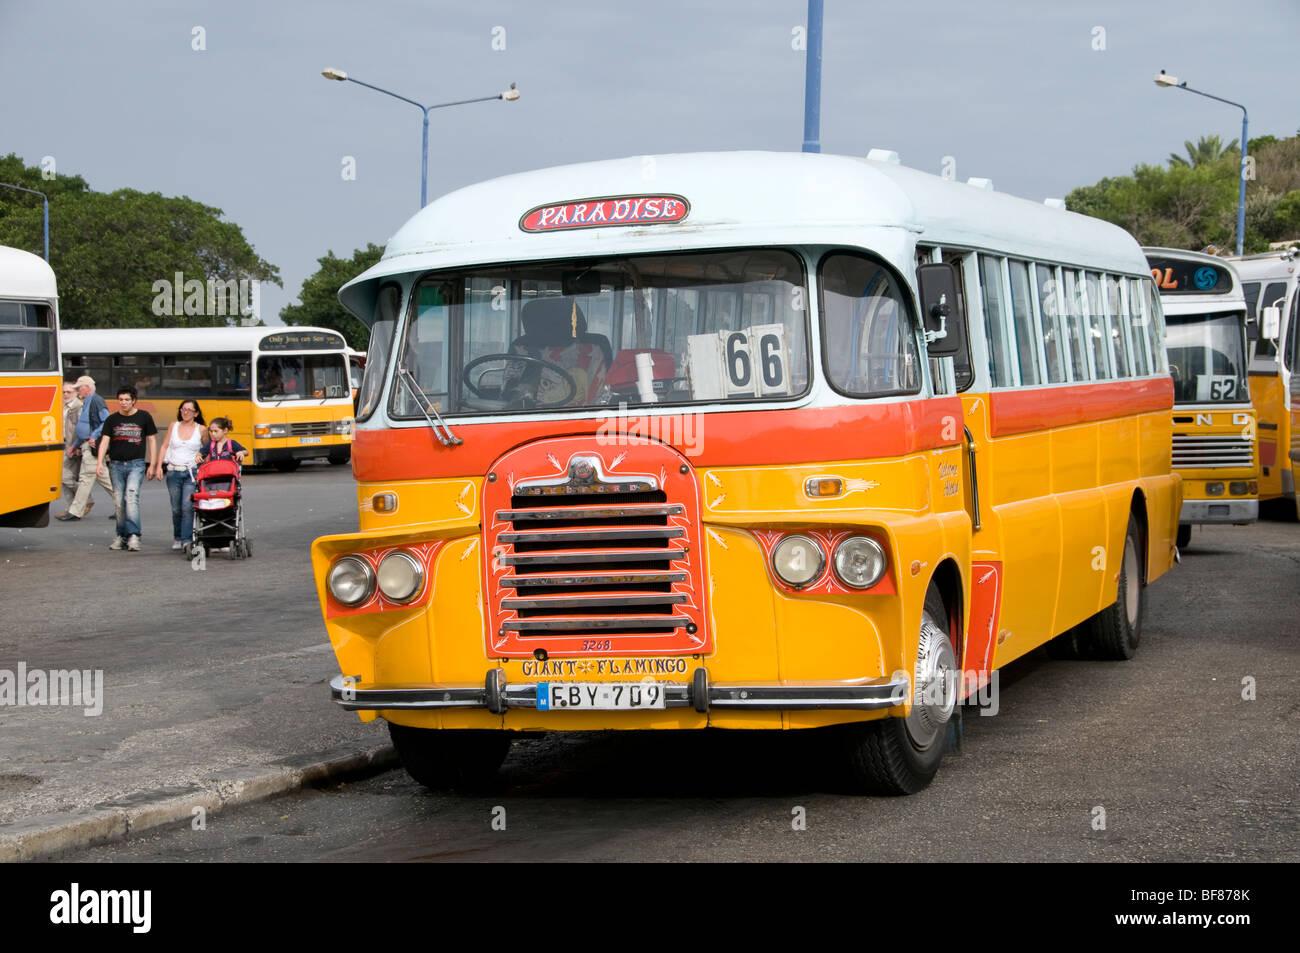 Malta Valletta City Bus Yellow Public Transport - Stock Image